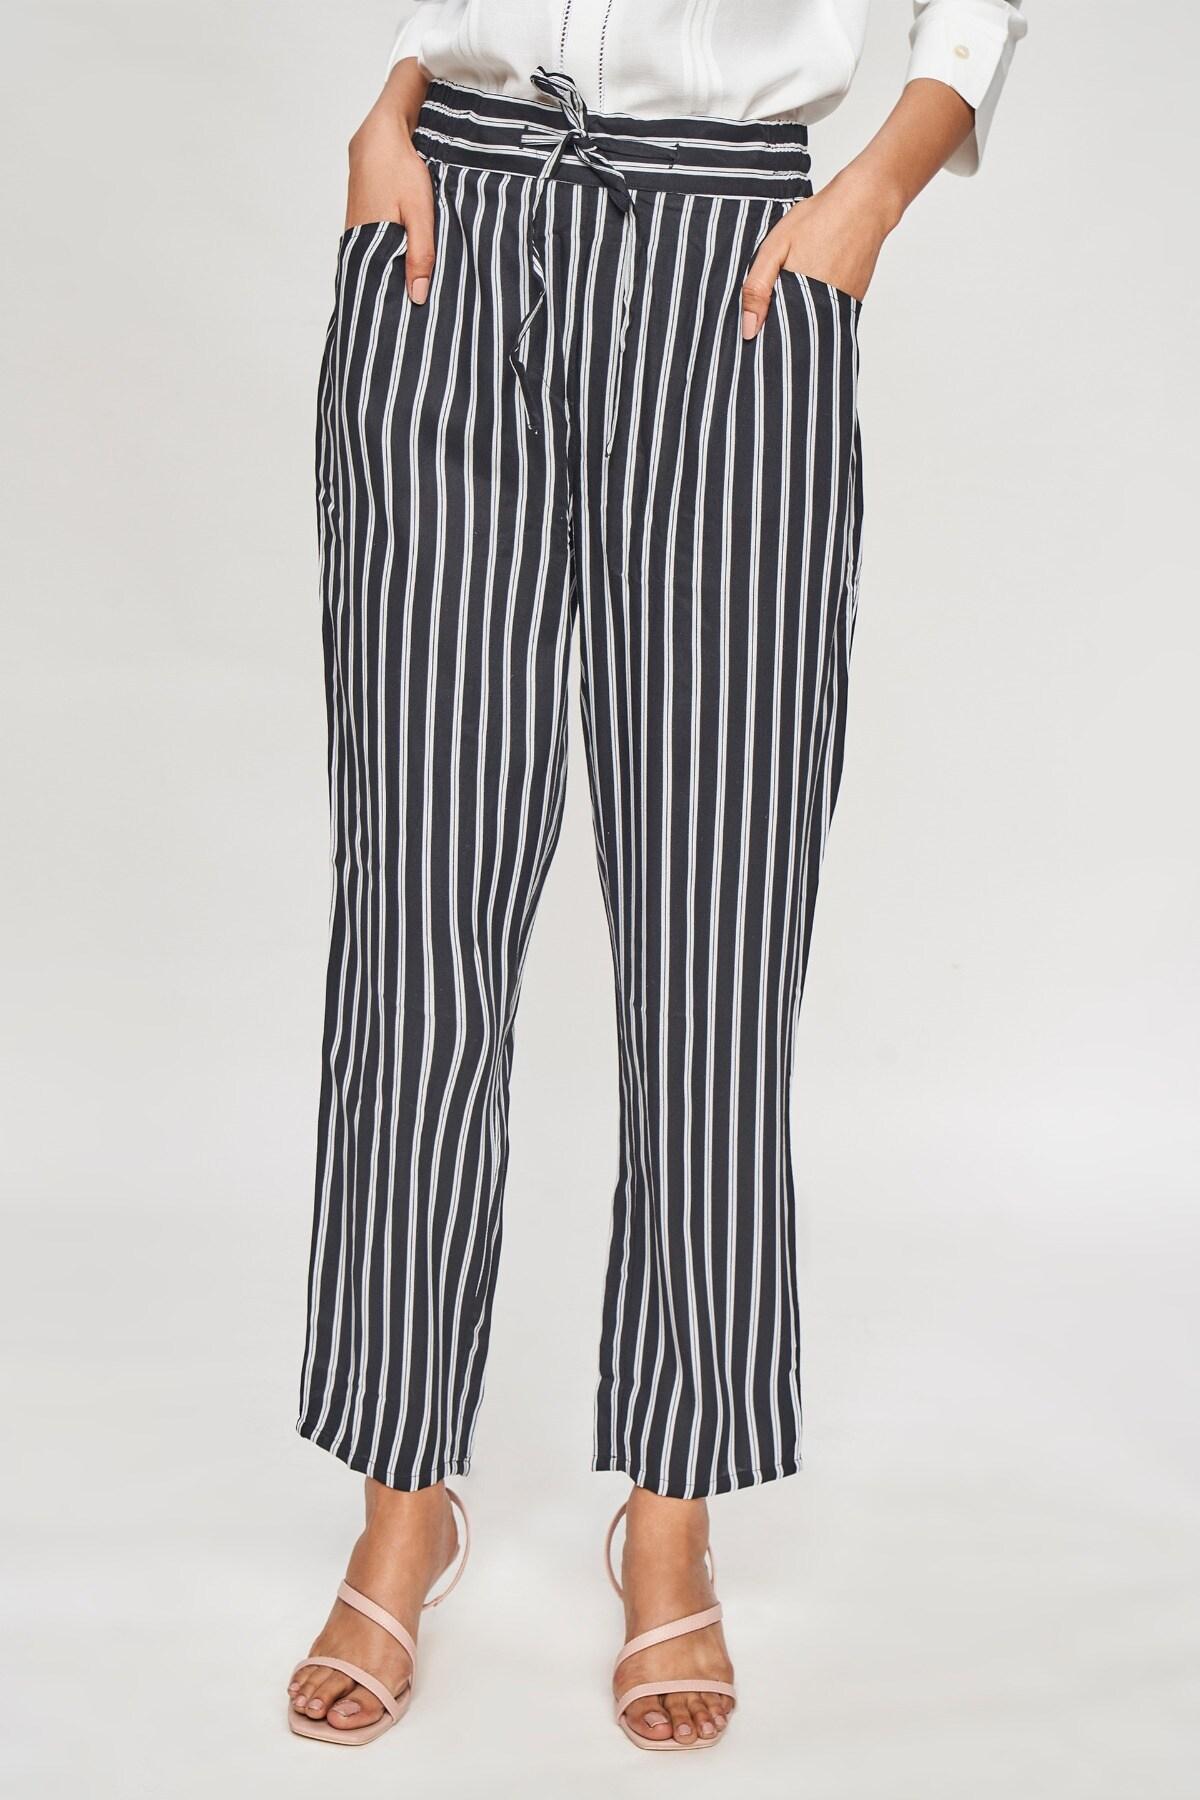 AND | Black & White Striped Printed Bottom